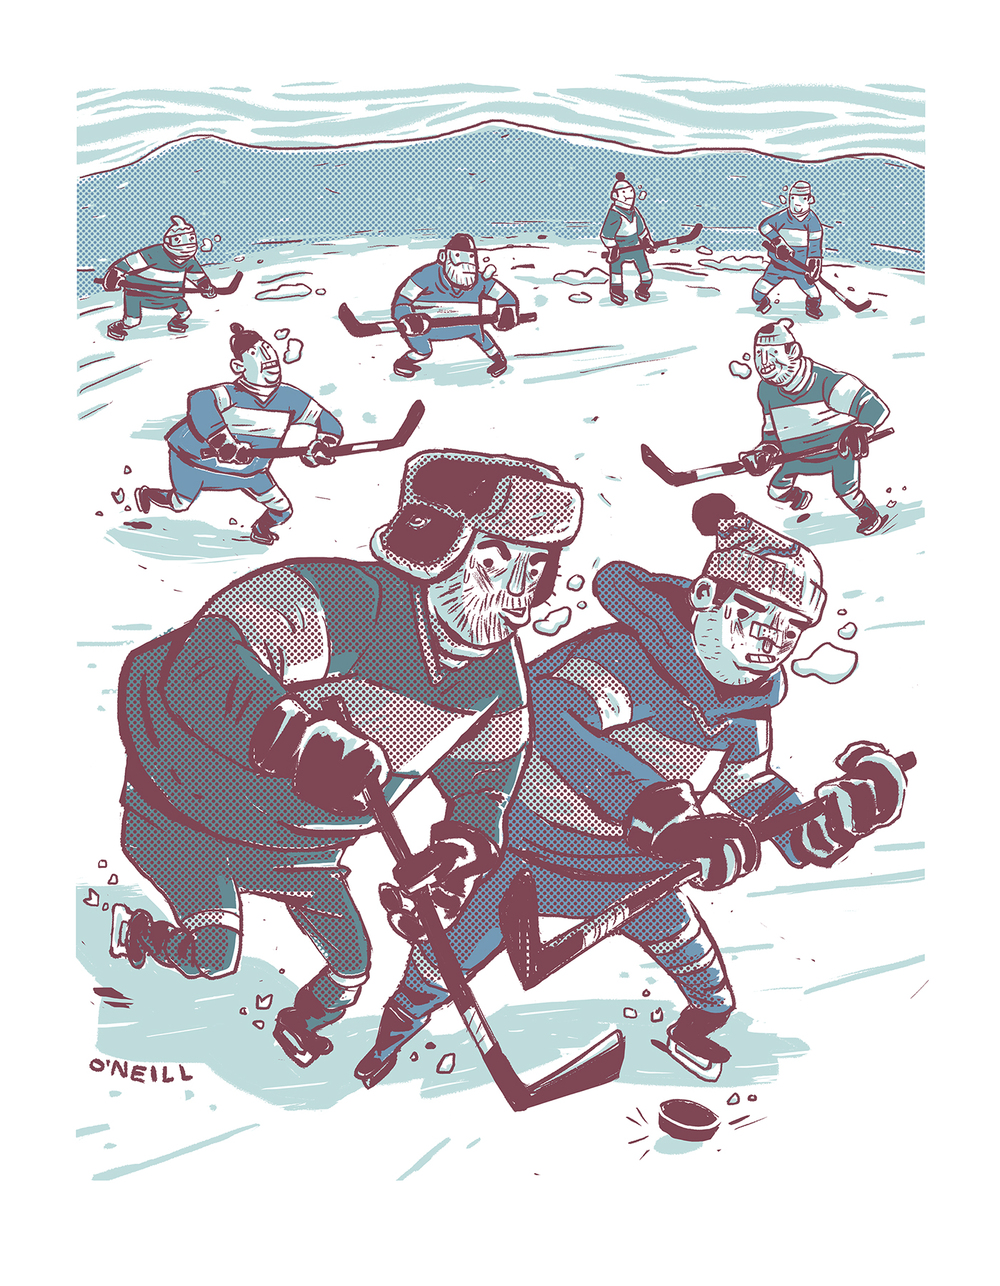 trifecta_pond_hockey.jpg